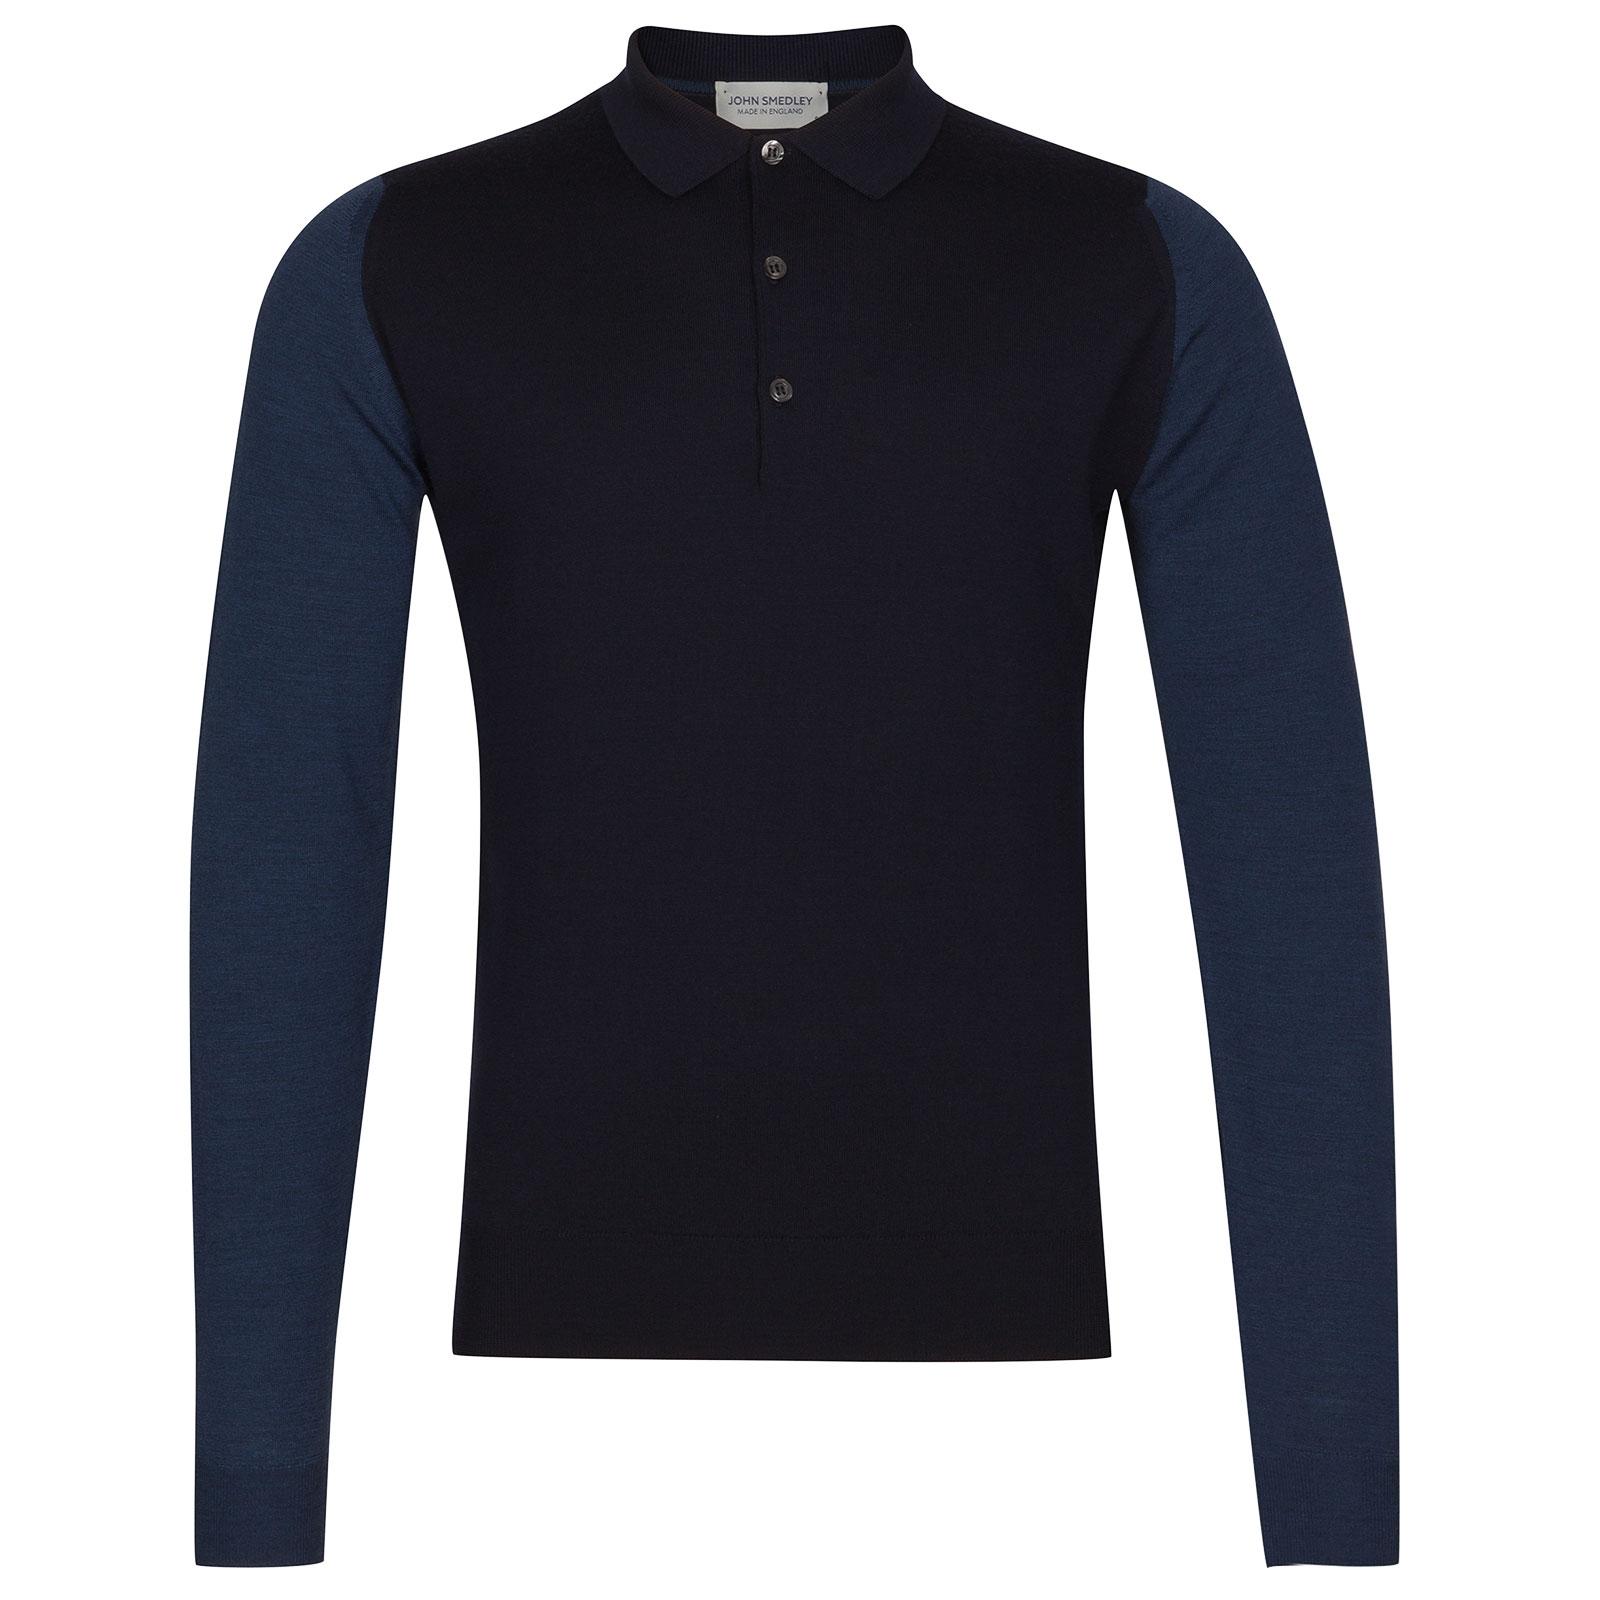 John Smedley Brightgate Extra Fine Merino Wool Shirt in Midnight-L